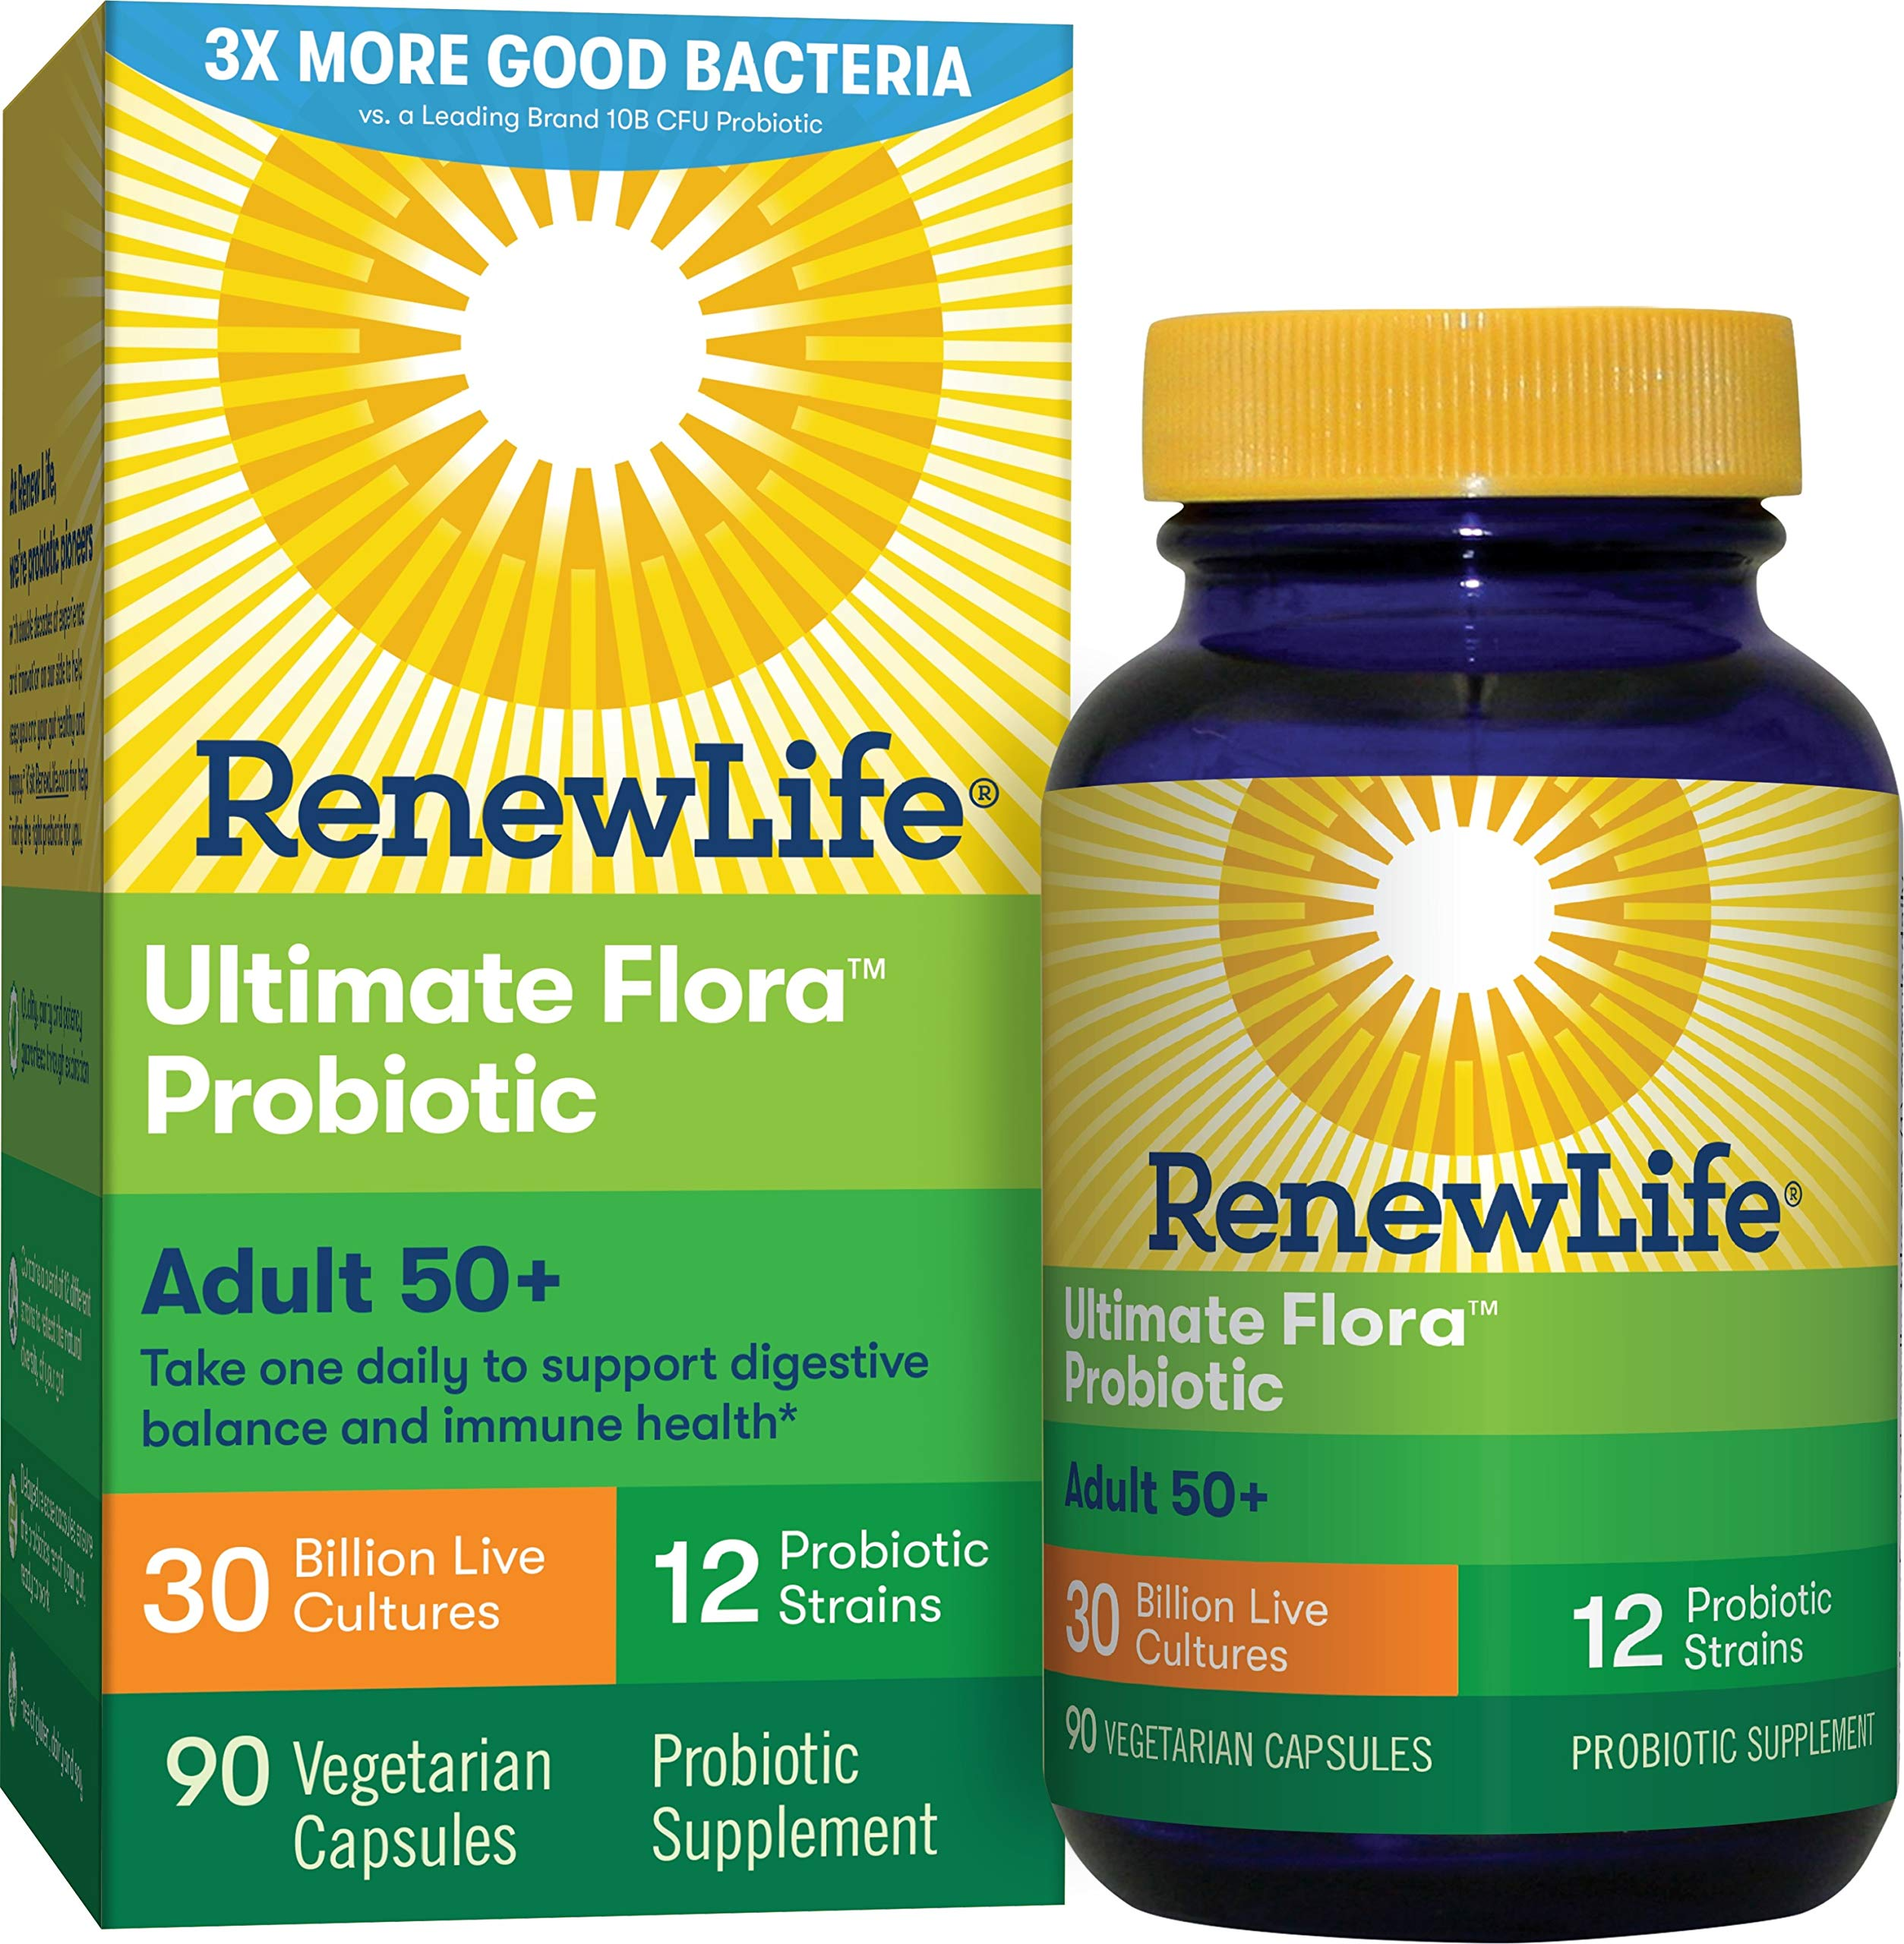 Renew Life Adult Probiotic - Ultimate Flora Adult 50+ Probiotic Supplement - Gluten, Dairy & Soy Free - 30 Billion CFU - 90 Vegetarian Capsules by Renew Life